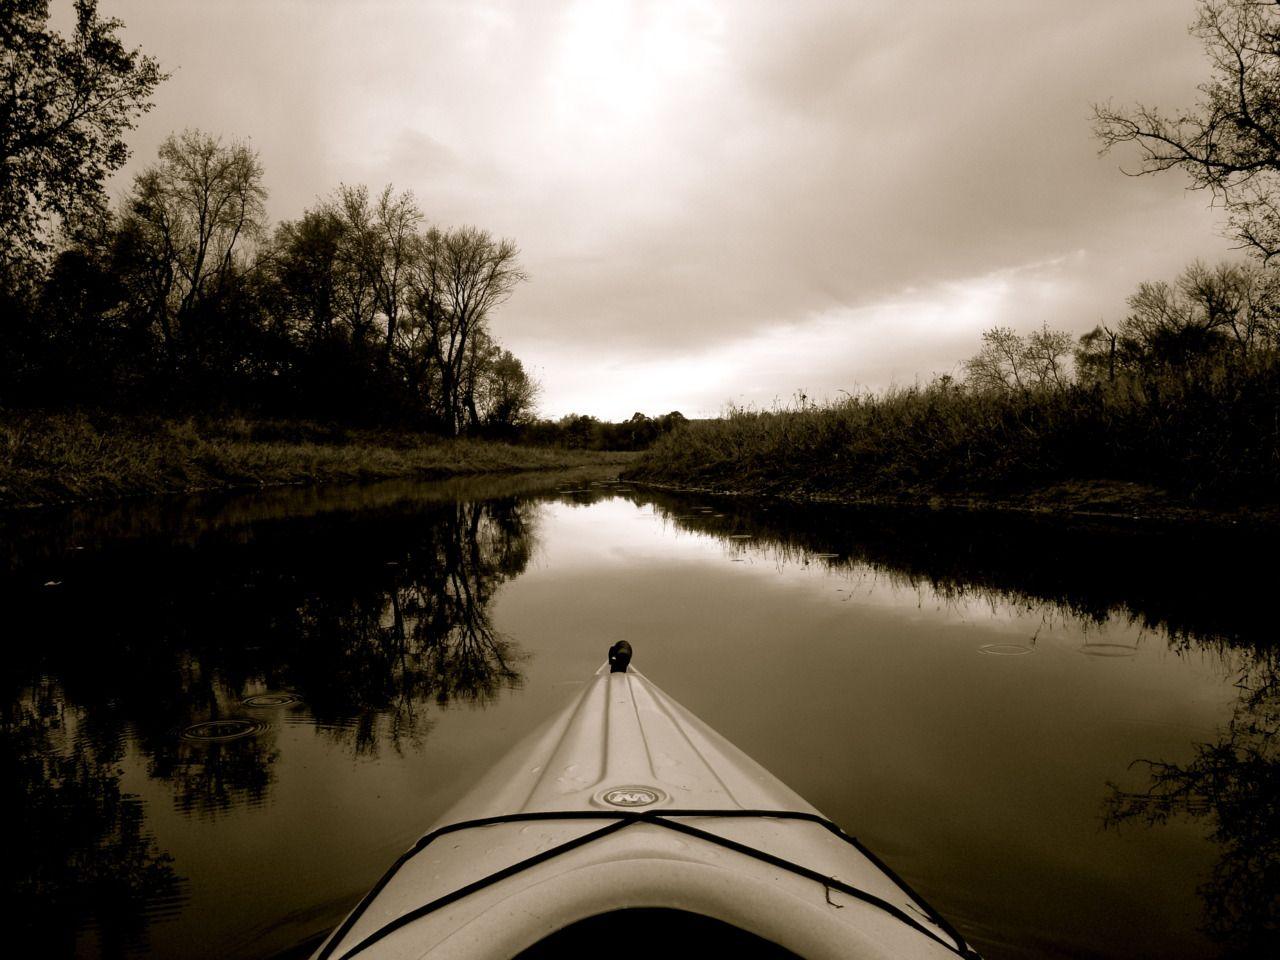 Get a kayak and go somewhere :)